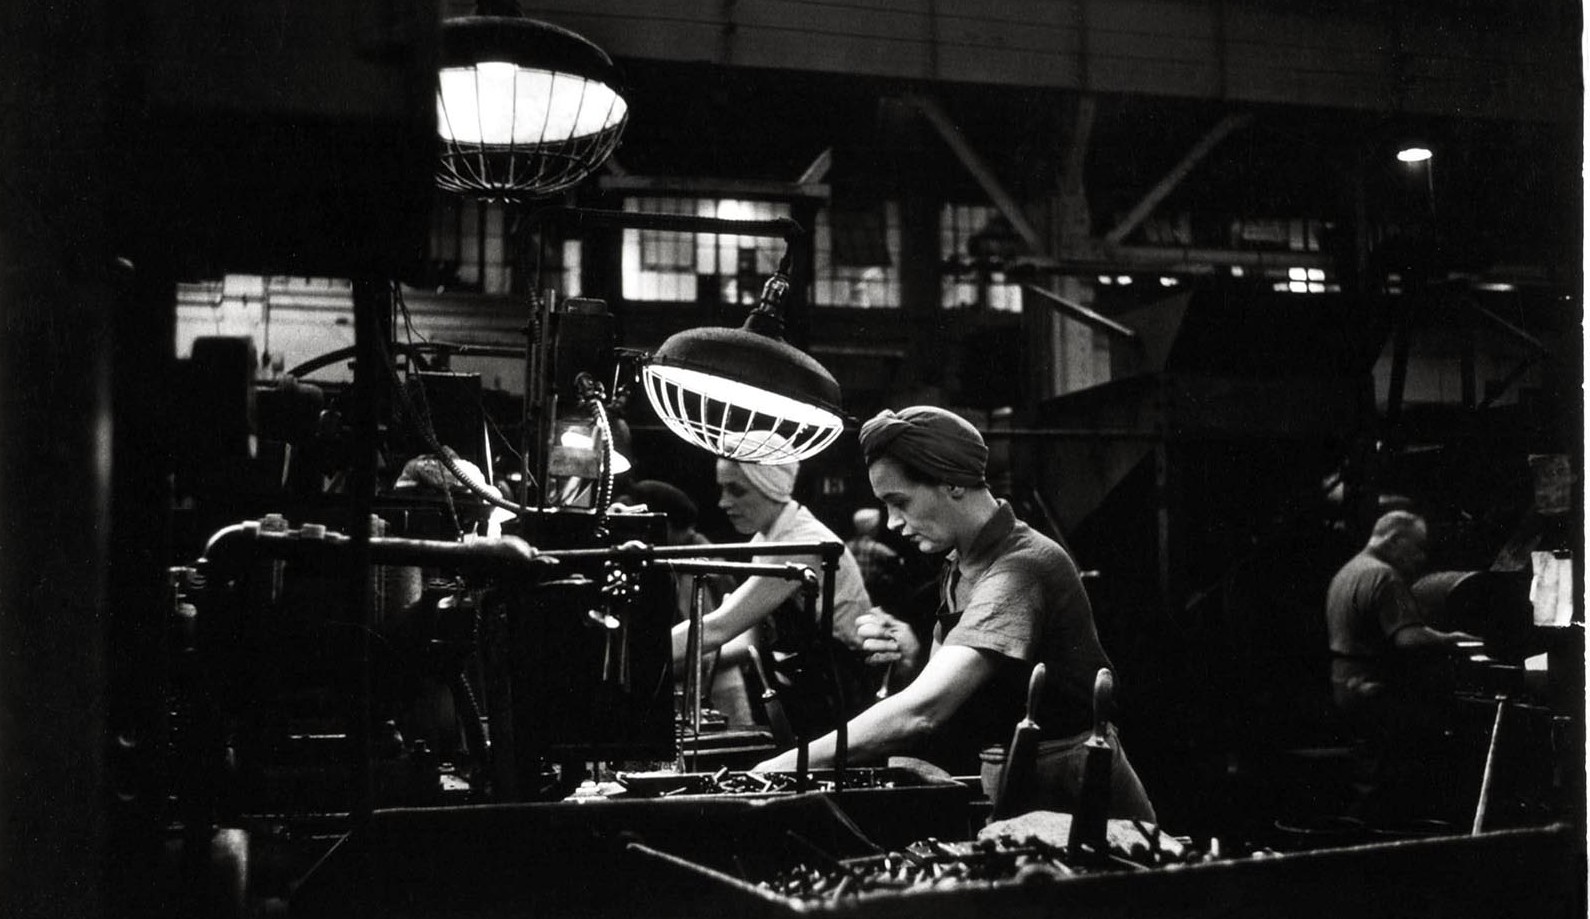 Pittsburgh Screw and Bolt–Woman Machine Operator